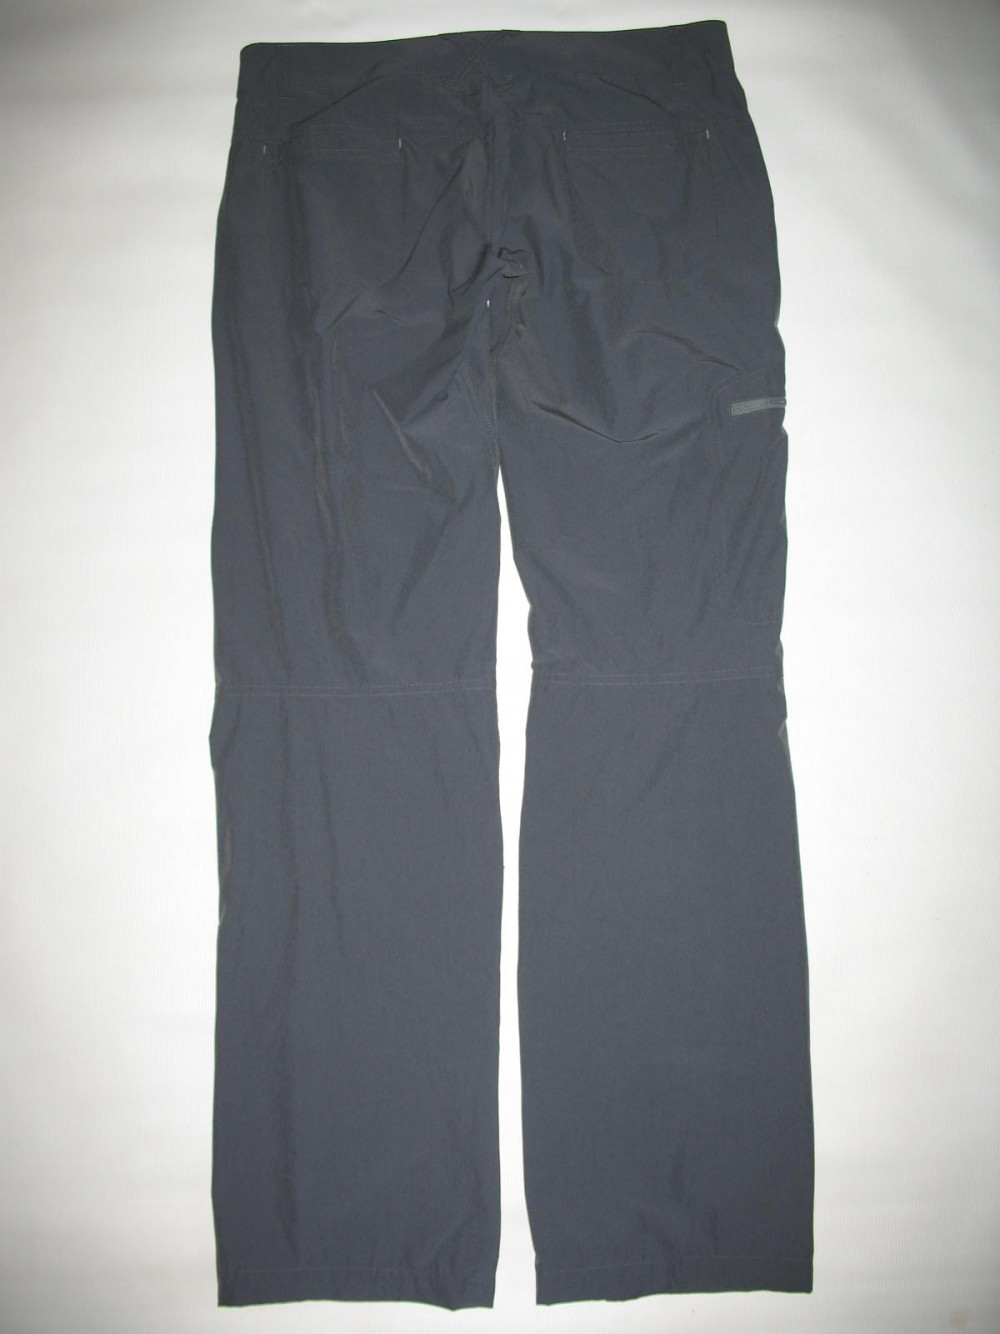 Штаны RAB helix pants lady (размер 12/L-XL) - 6